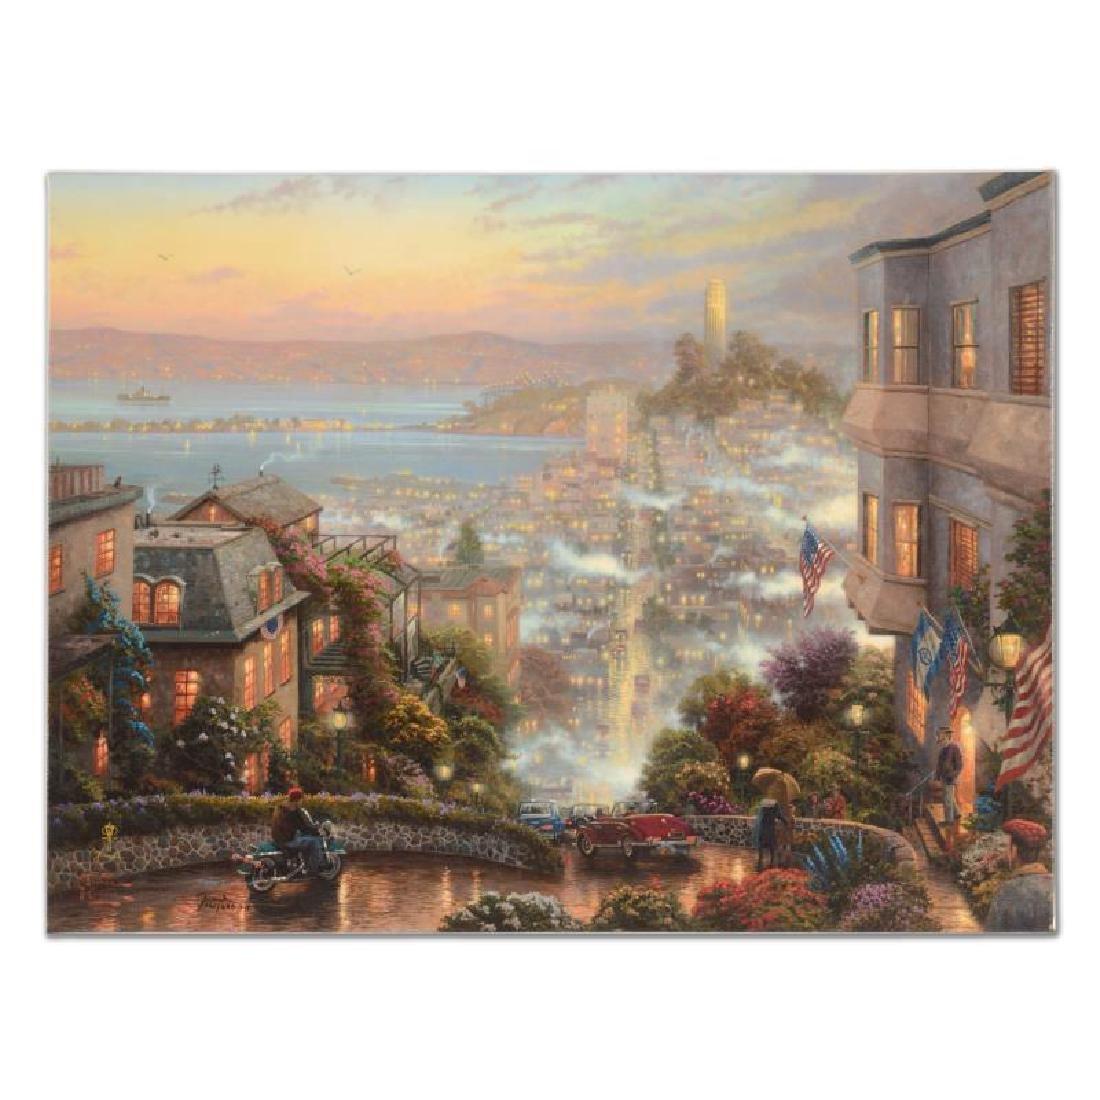 San Francisco Lombard St. by Kinkade (1958-2012)